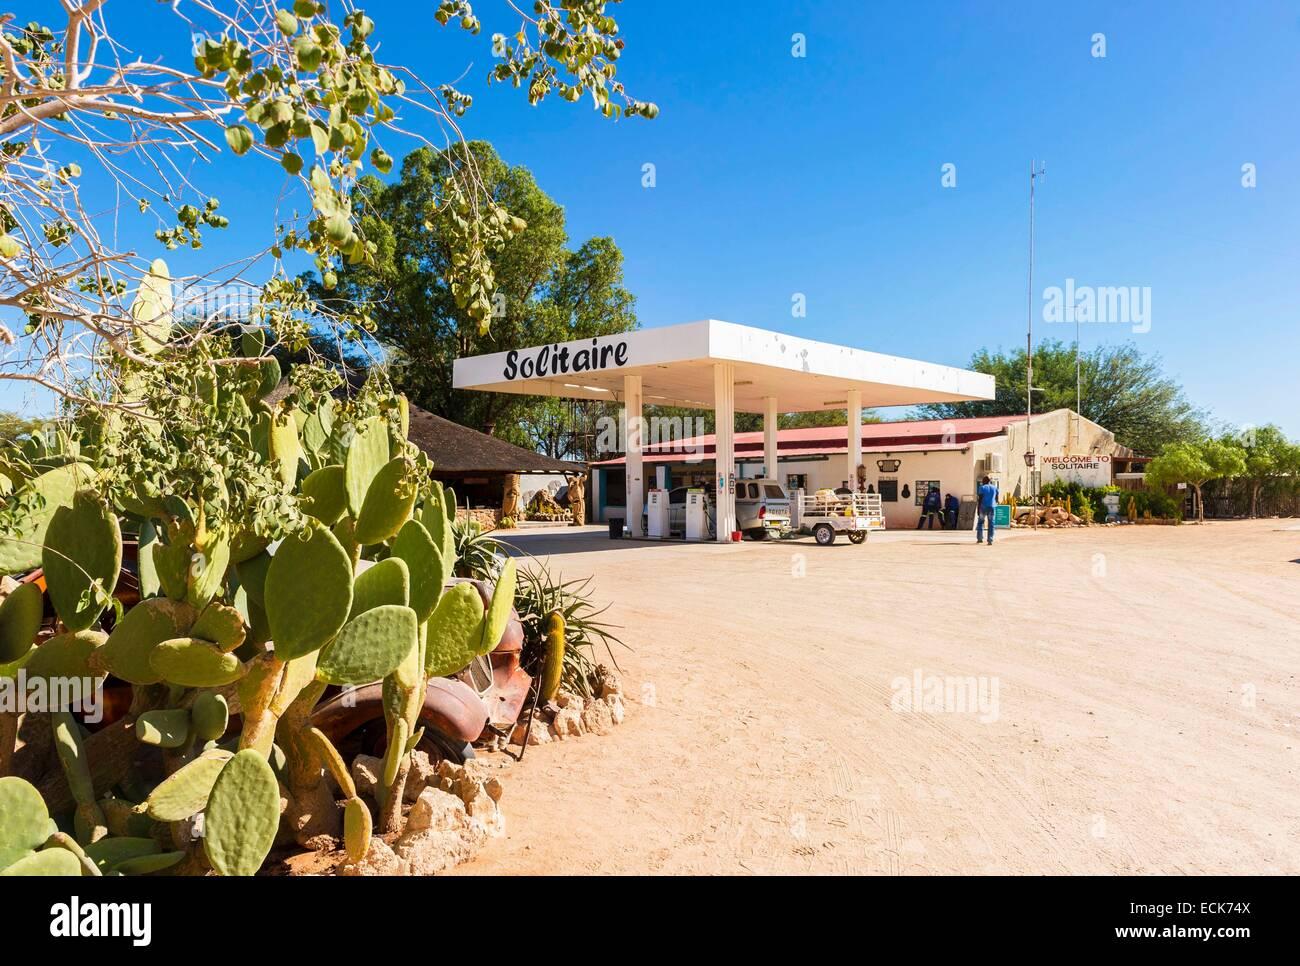 Namibia, Khomas region, Solitaire petrol station - Stock Image